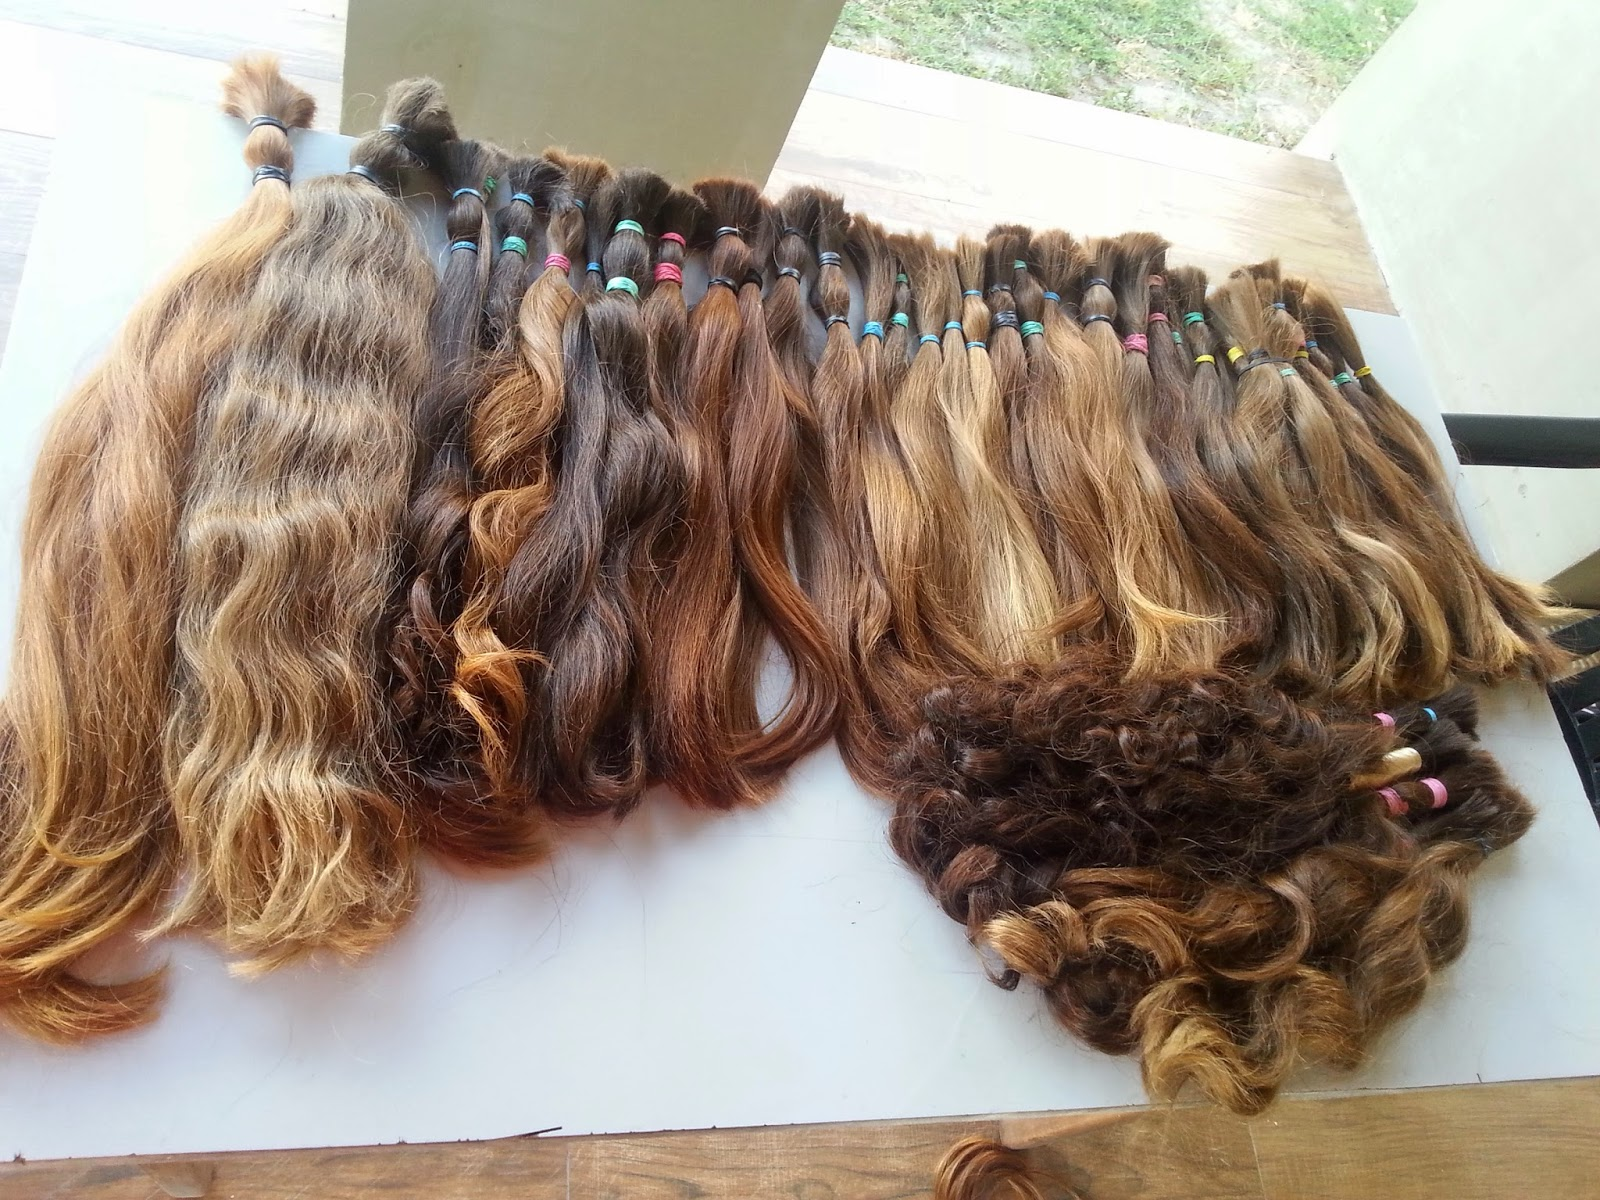 Predlžovanie vlasov  Predlžovanie vlasov e210413c3c3